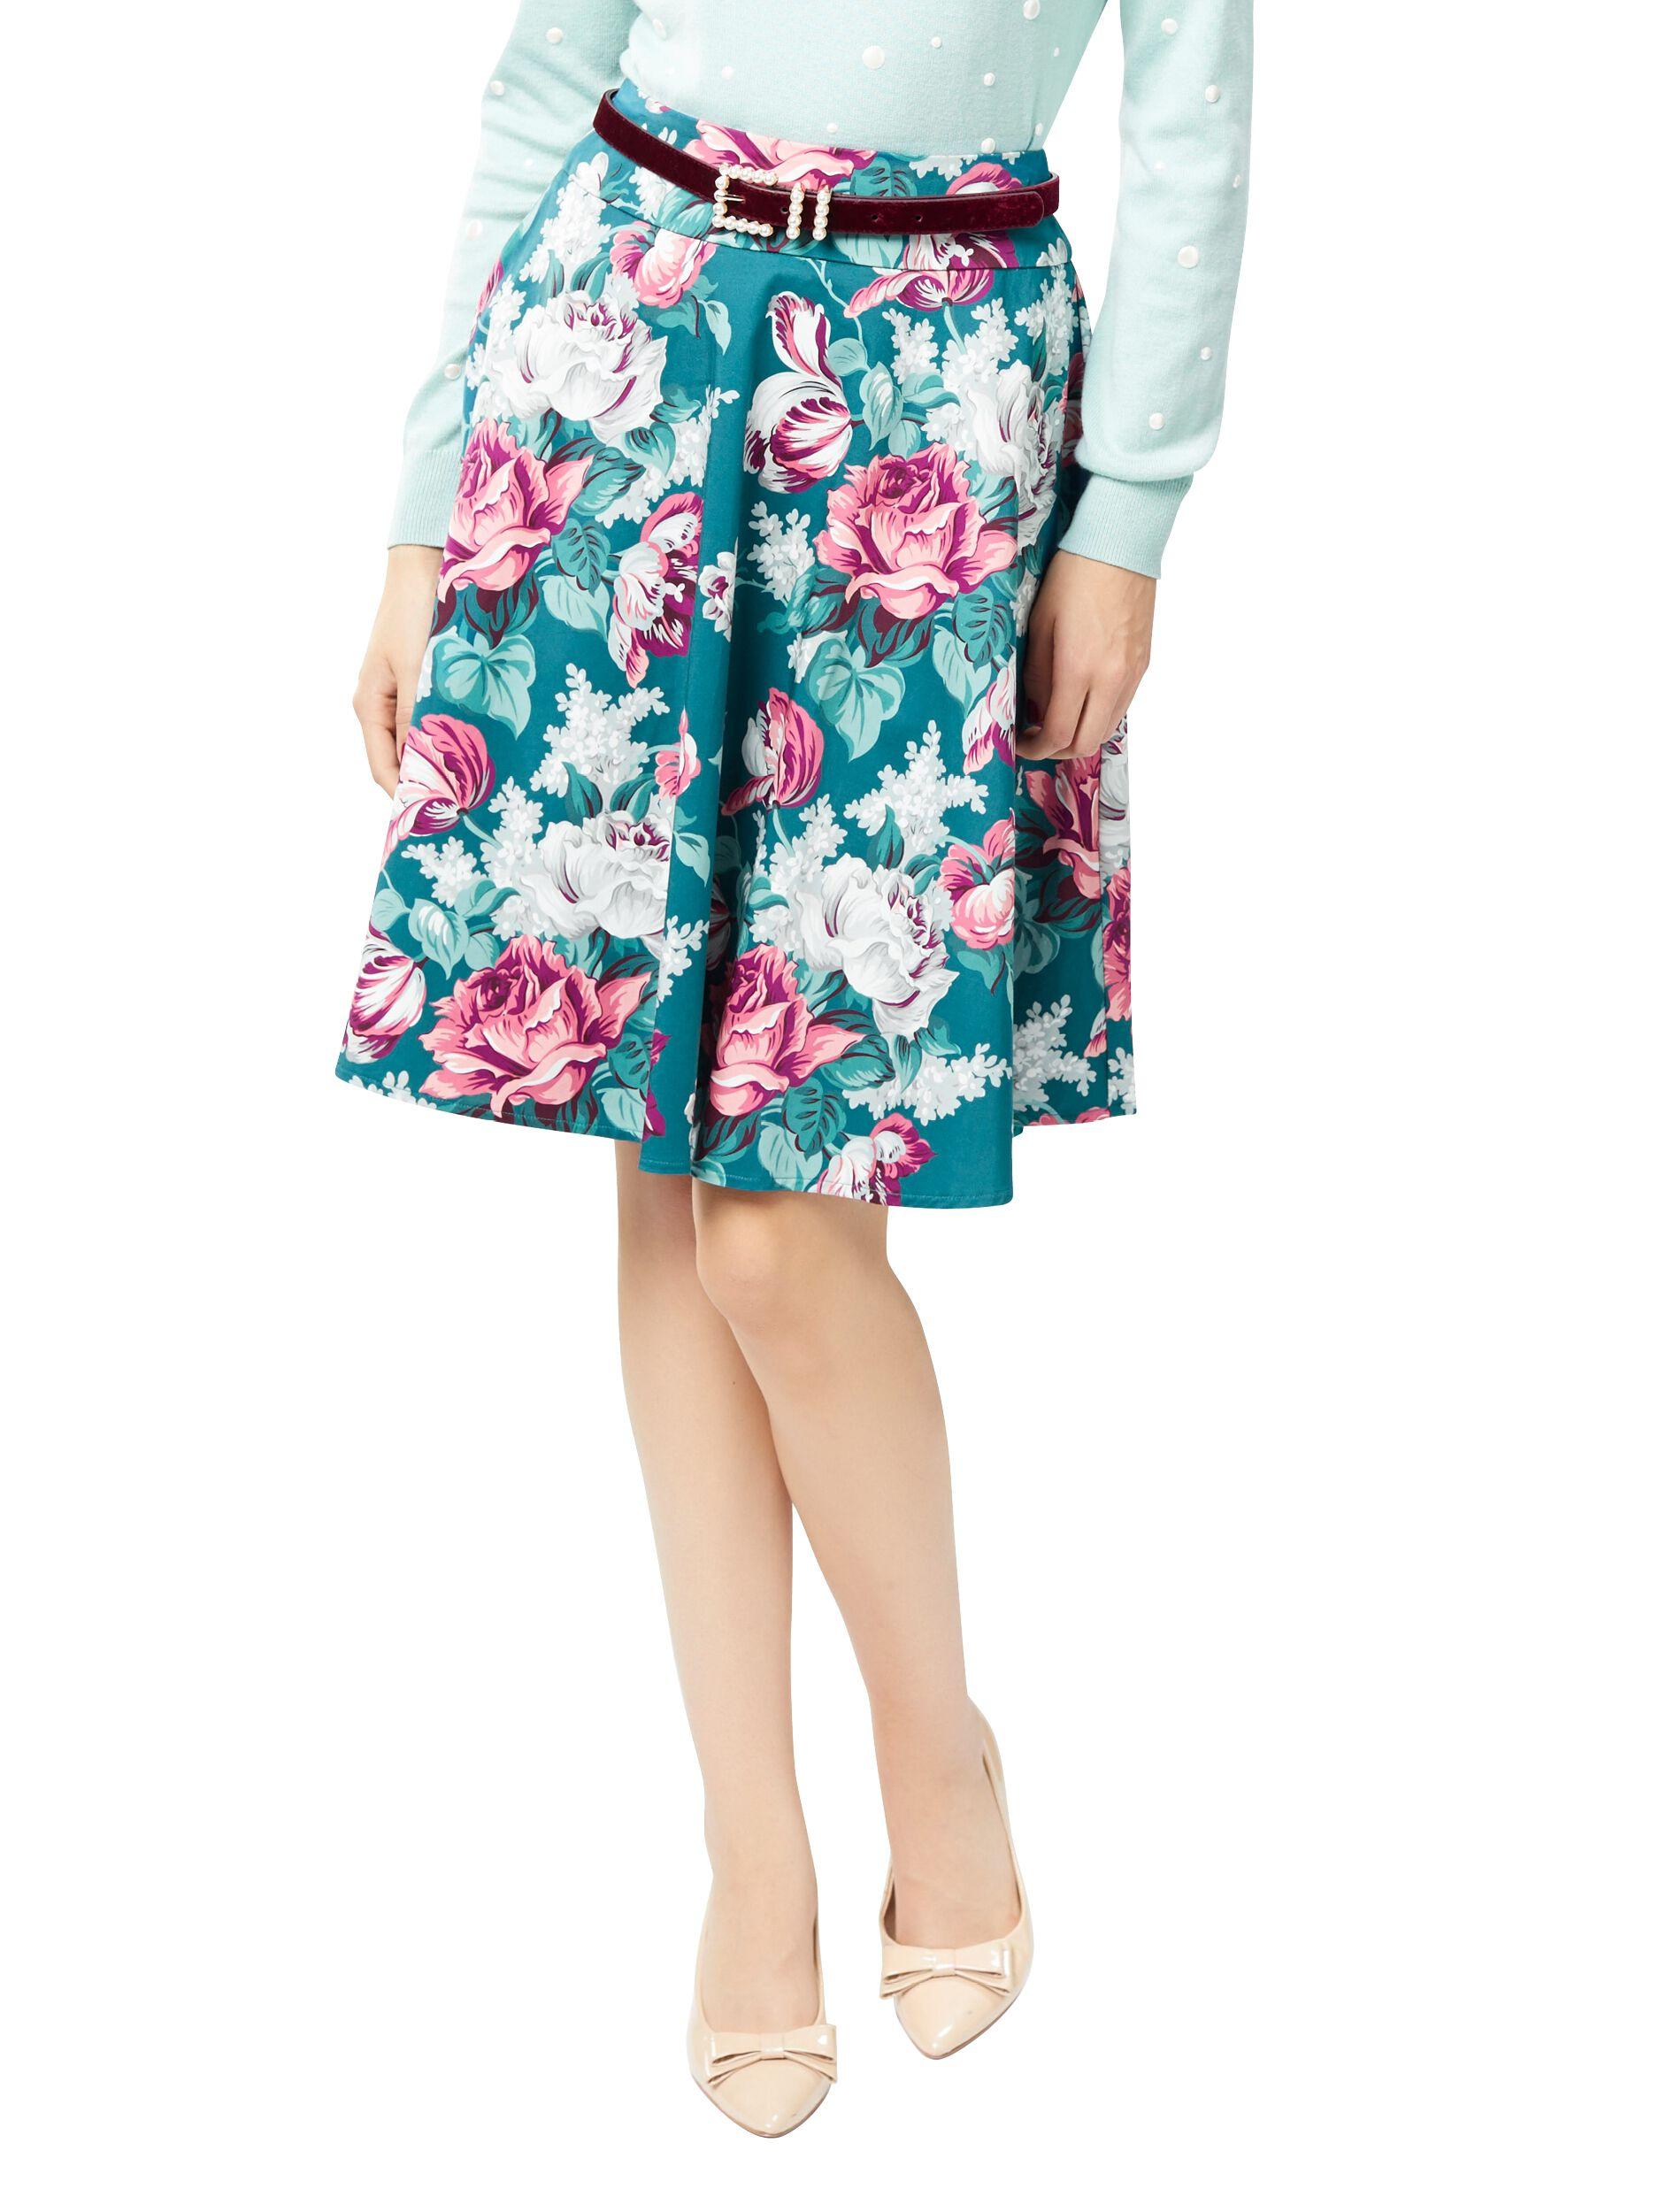 Venice Floral Skirt